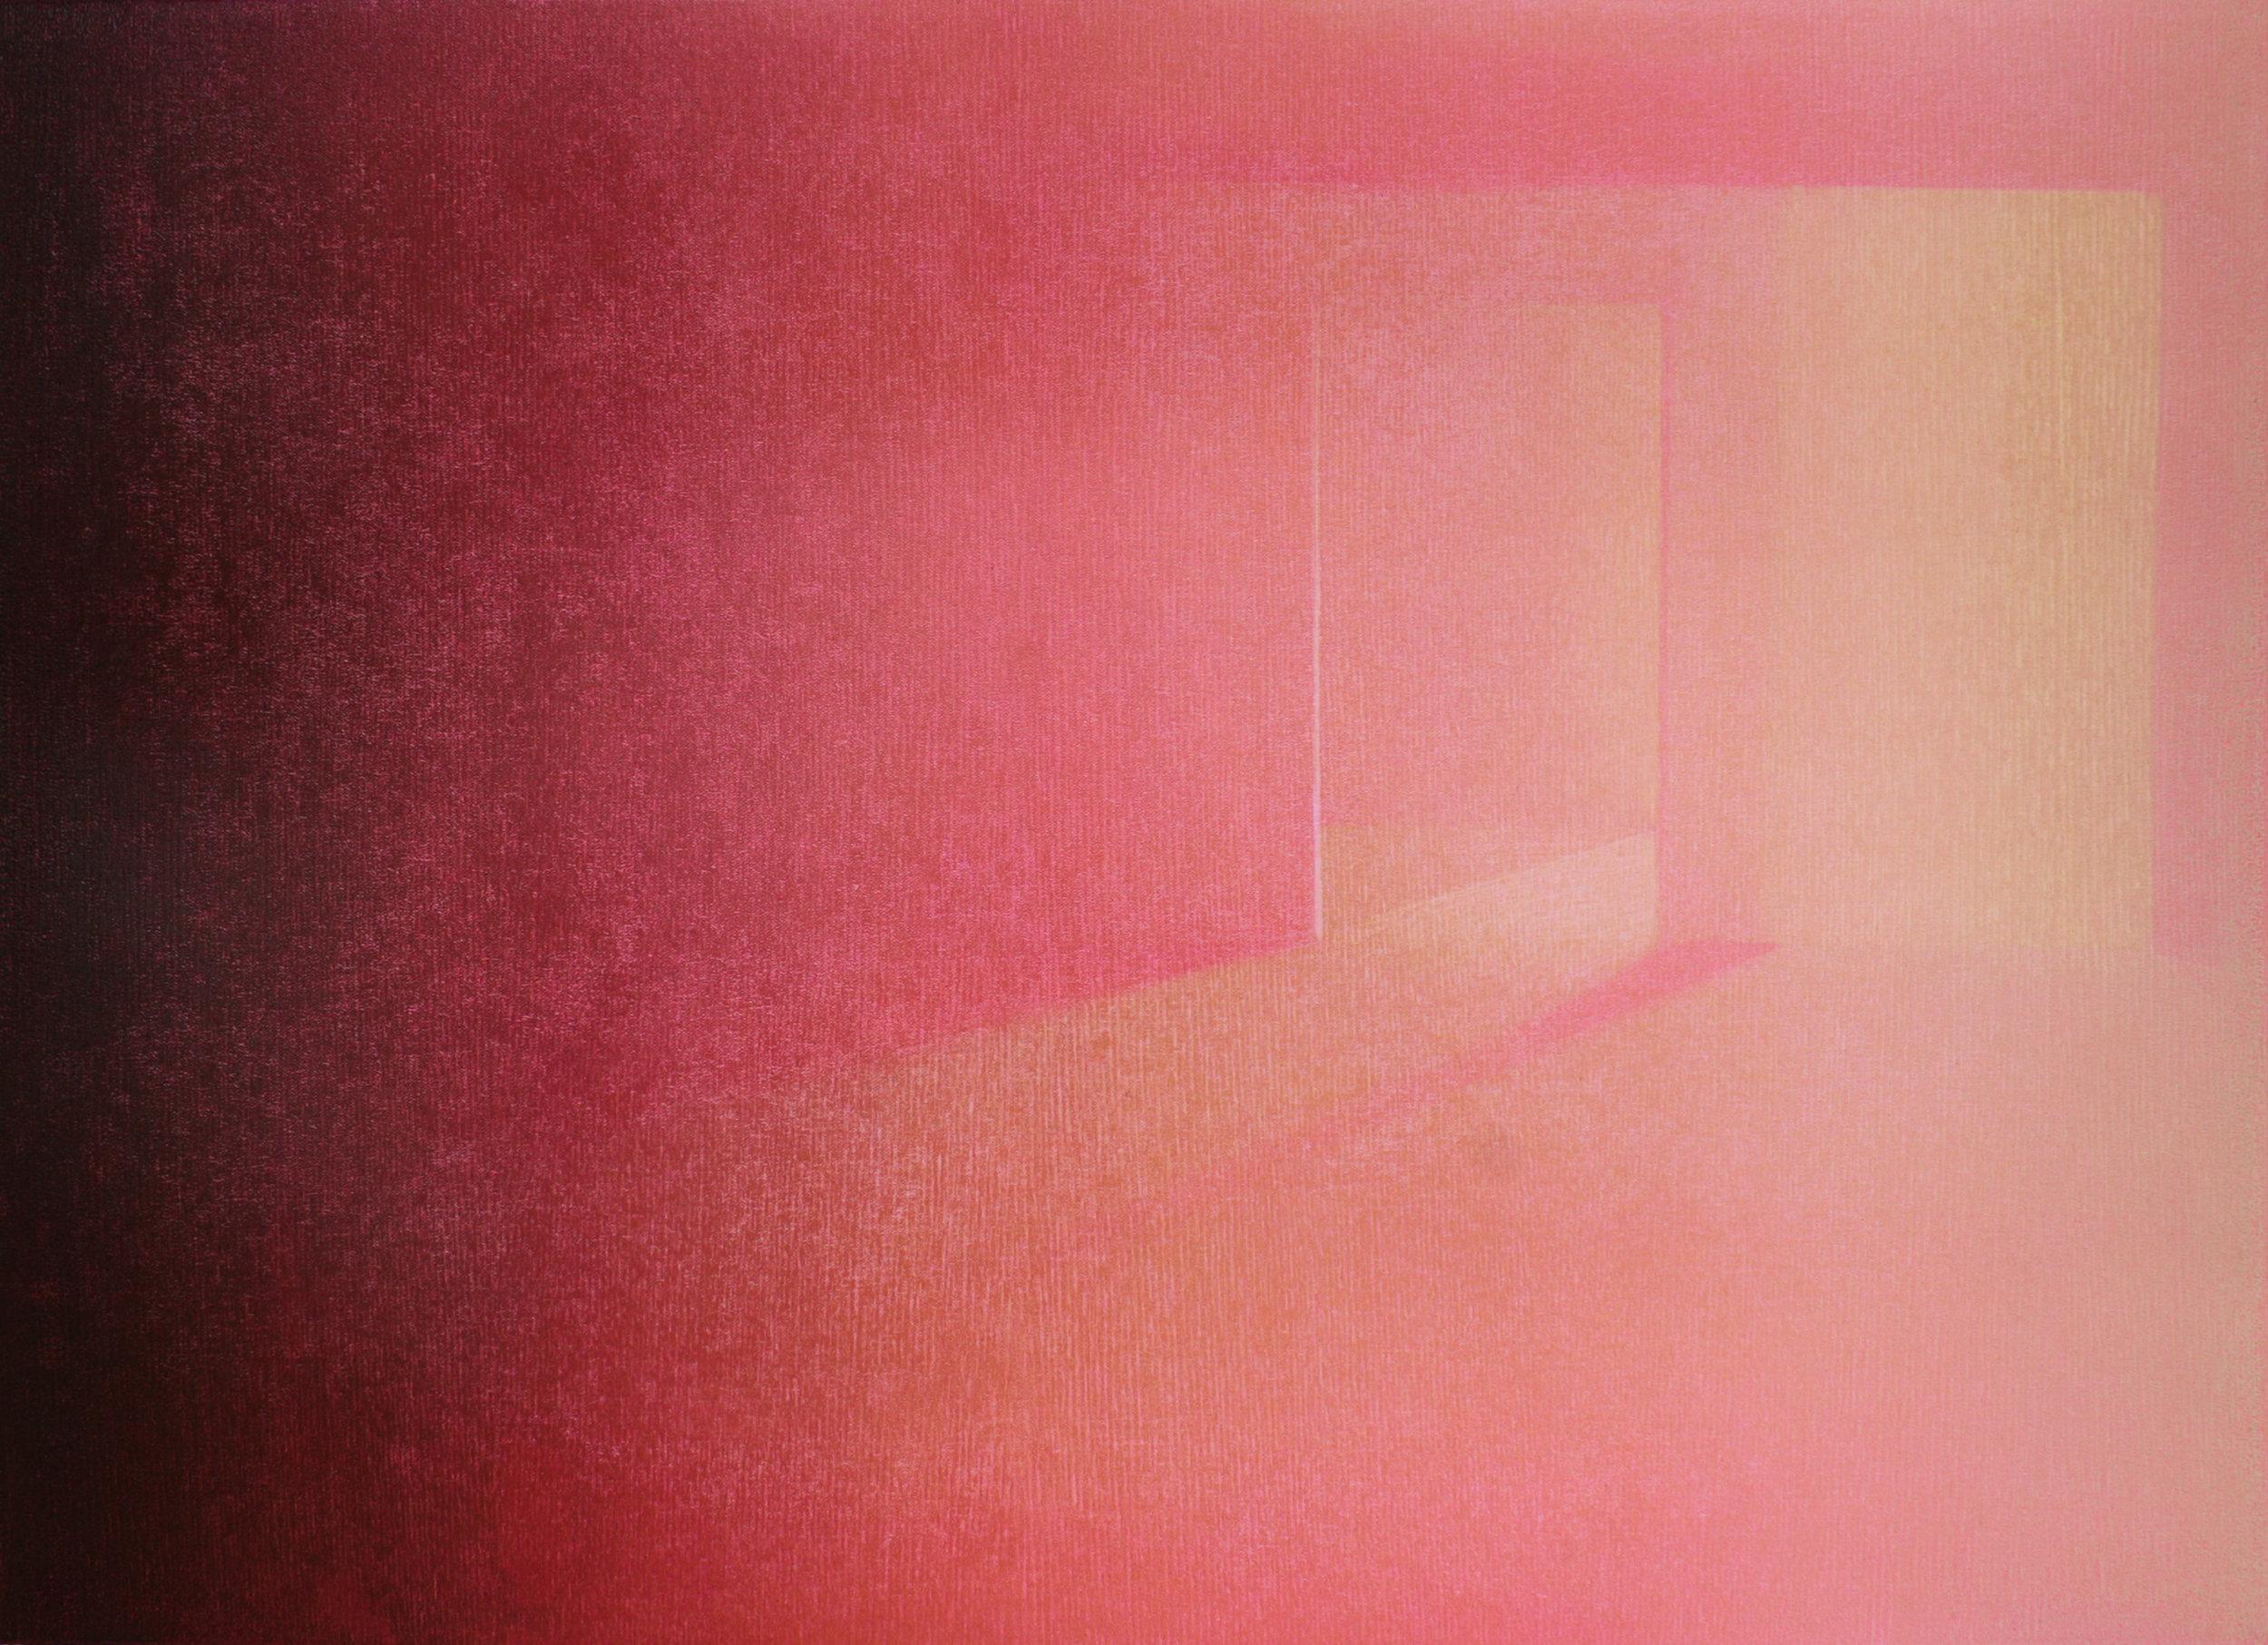 Praween PIANGCHOOMPU, Equilibrium #10, 2019, Woodcut on Paper, 1 of 5, 42 x 60 cm, Affinity Art-3.jpg